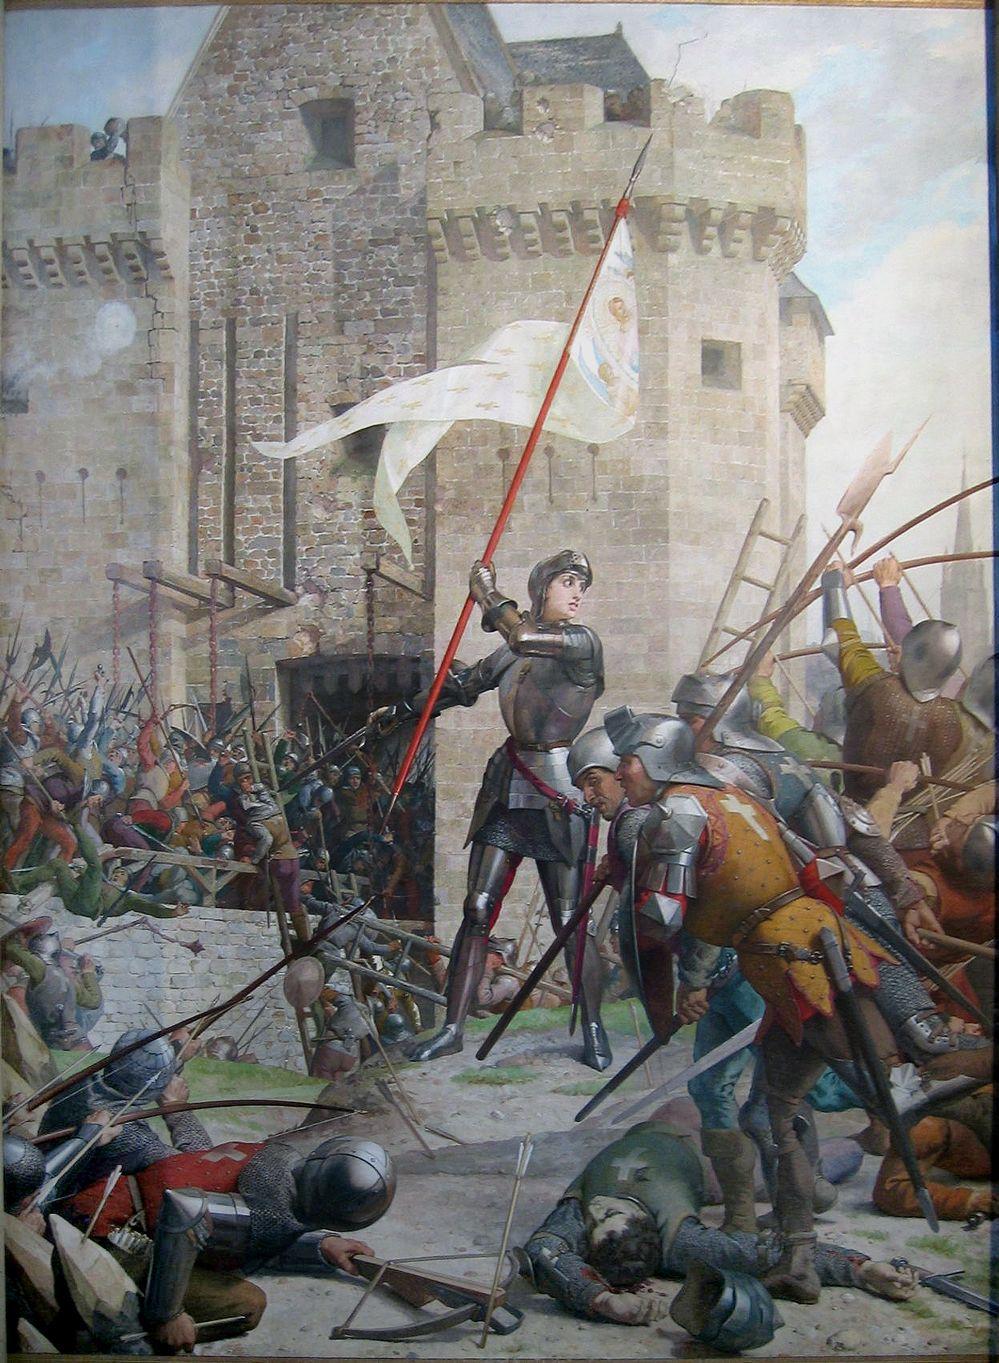 Joan of Arc - Jeanne d'Arc (1412 - 1431)